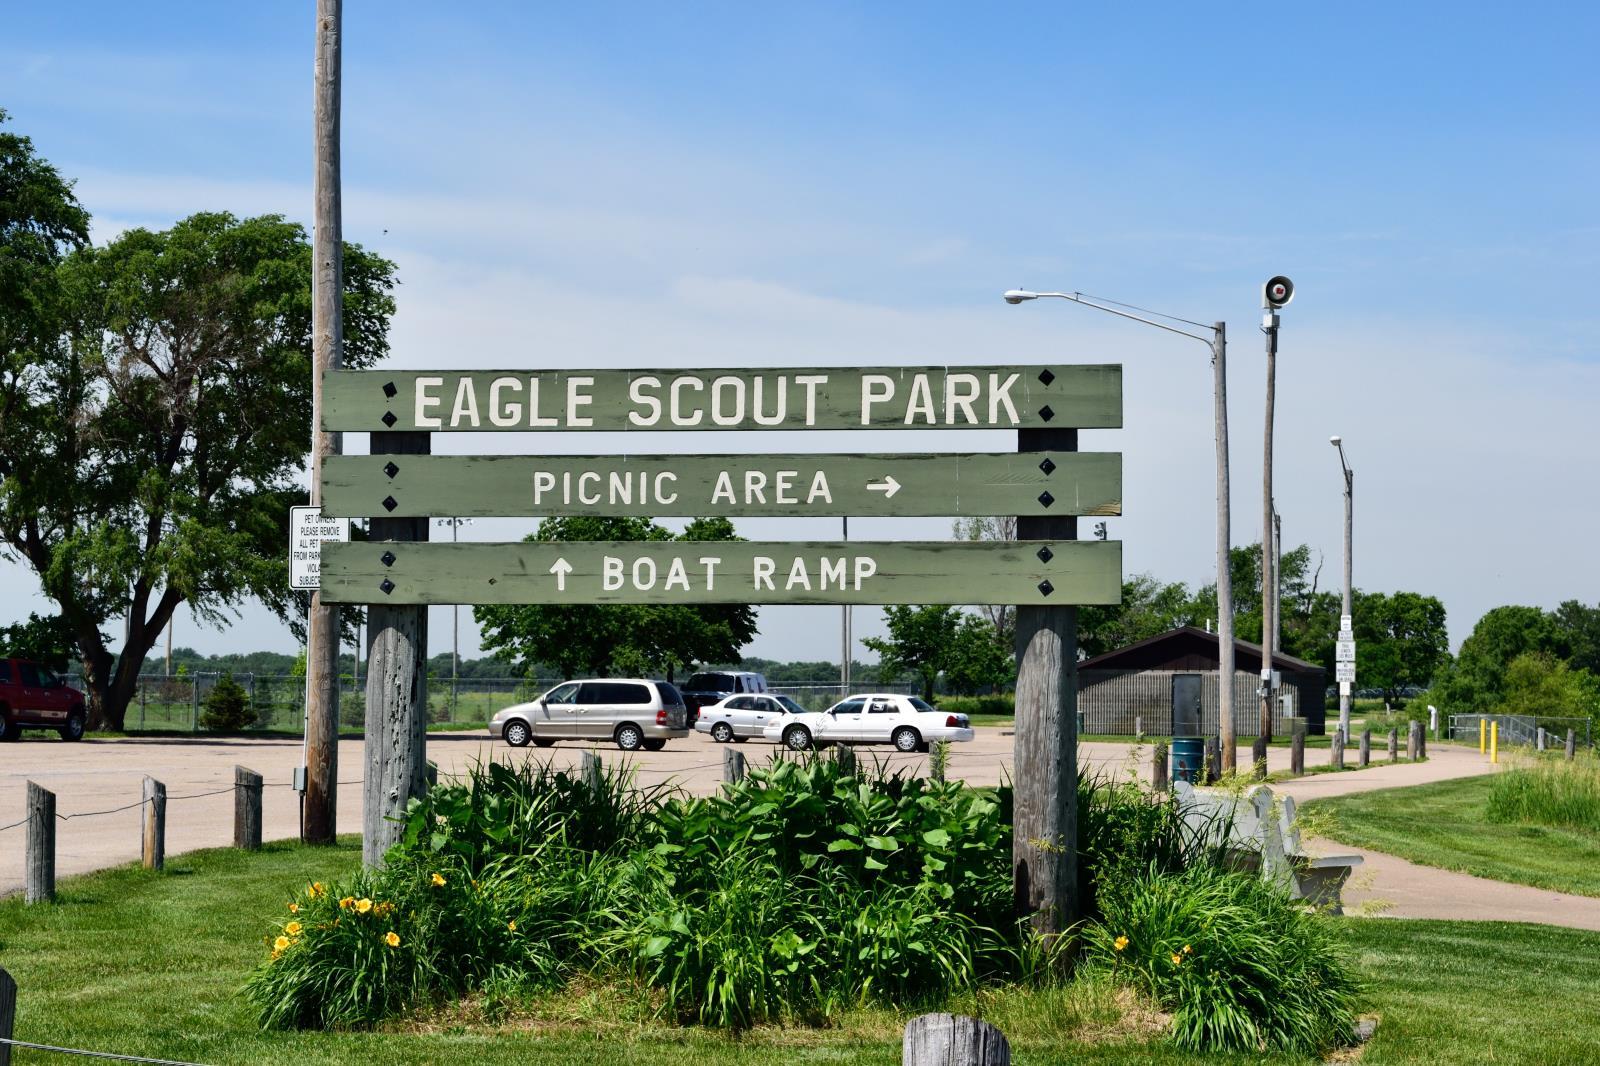 Eagle Scout Park City Of Grand Island Ne